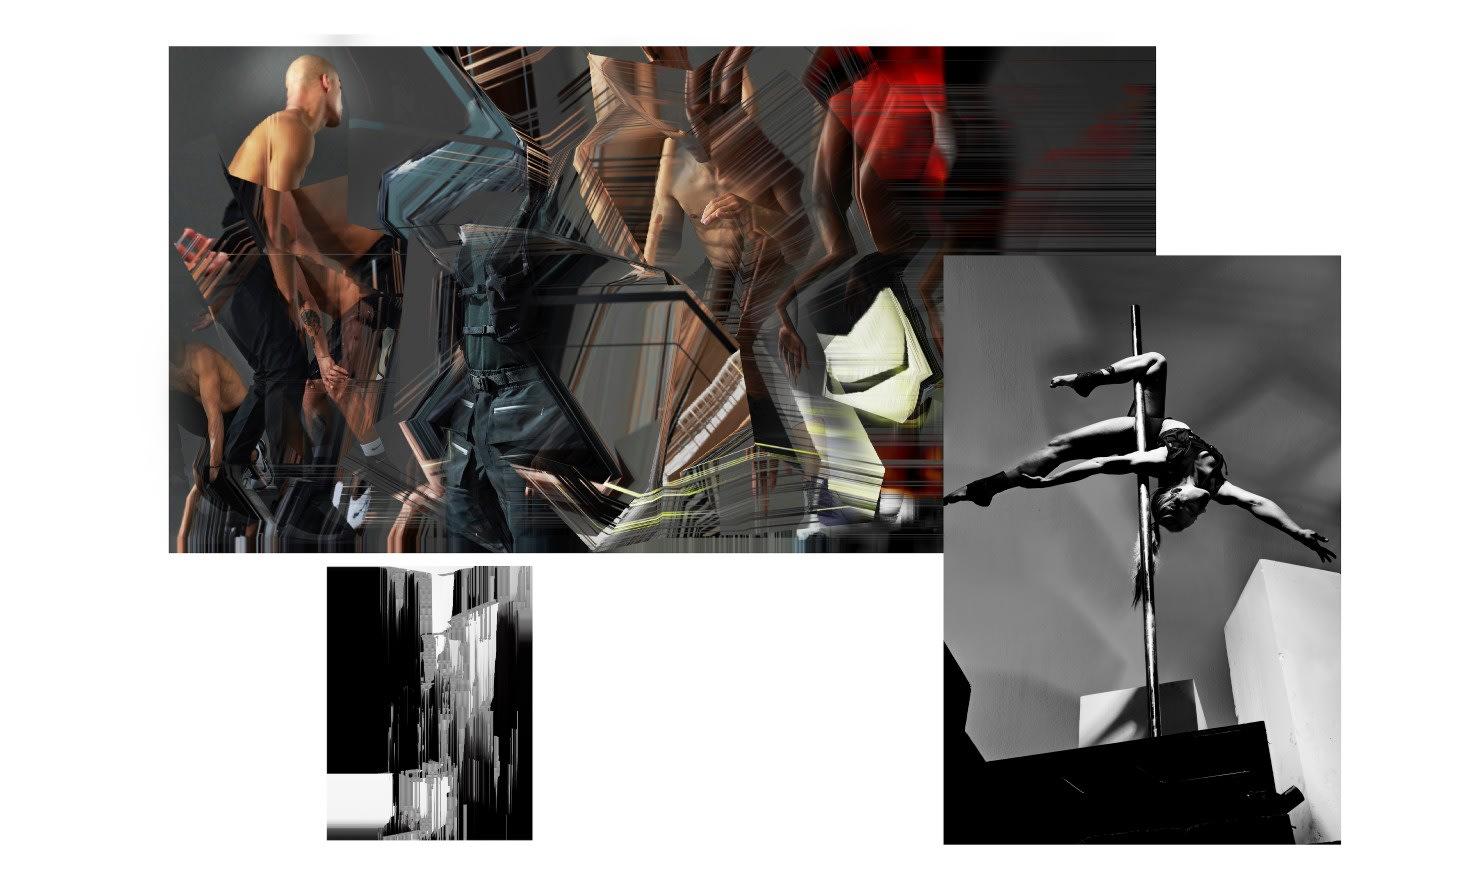 Matthew M. Williams x Nike (Concept Image)